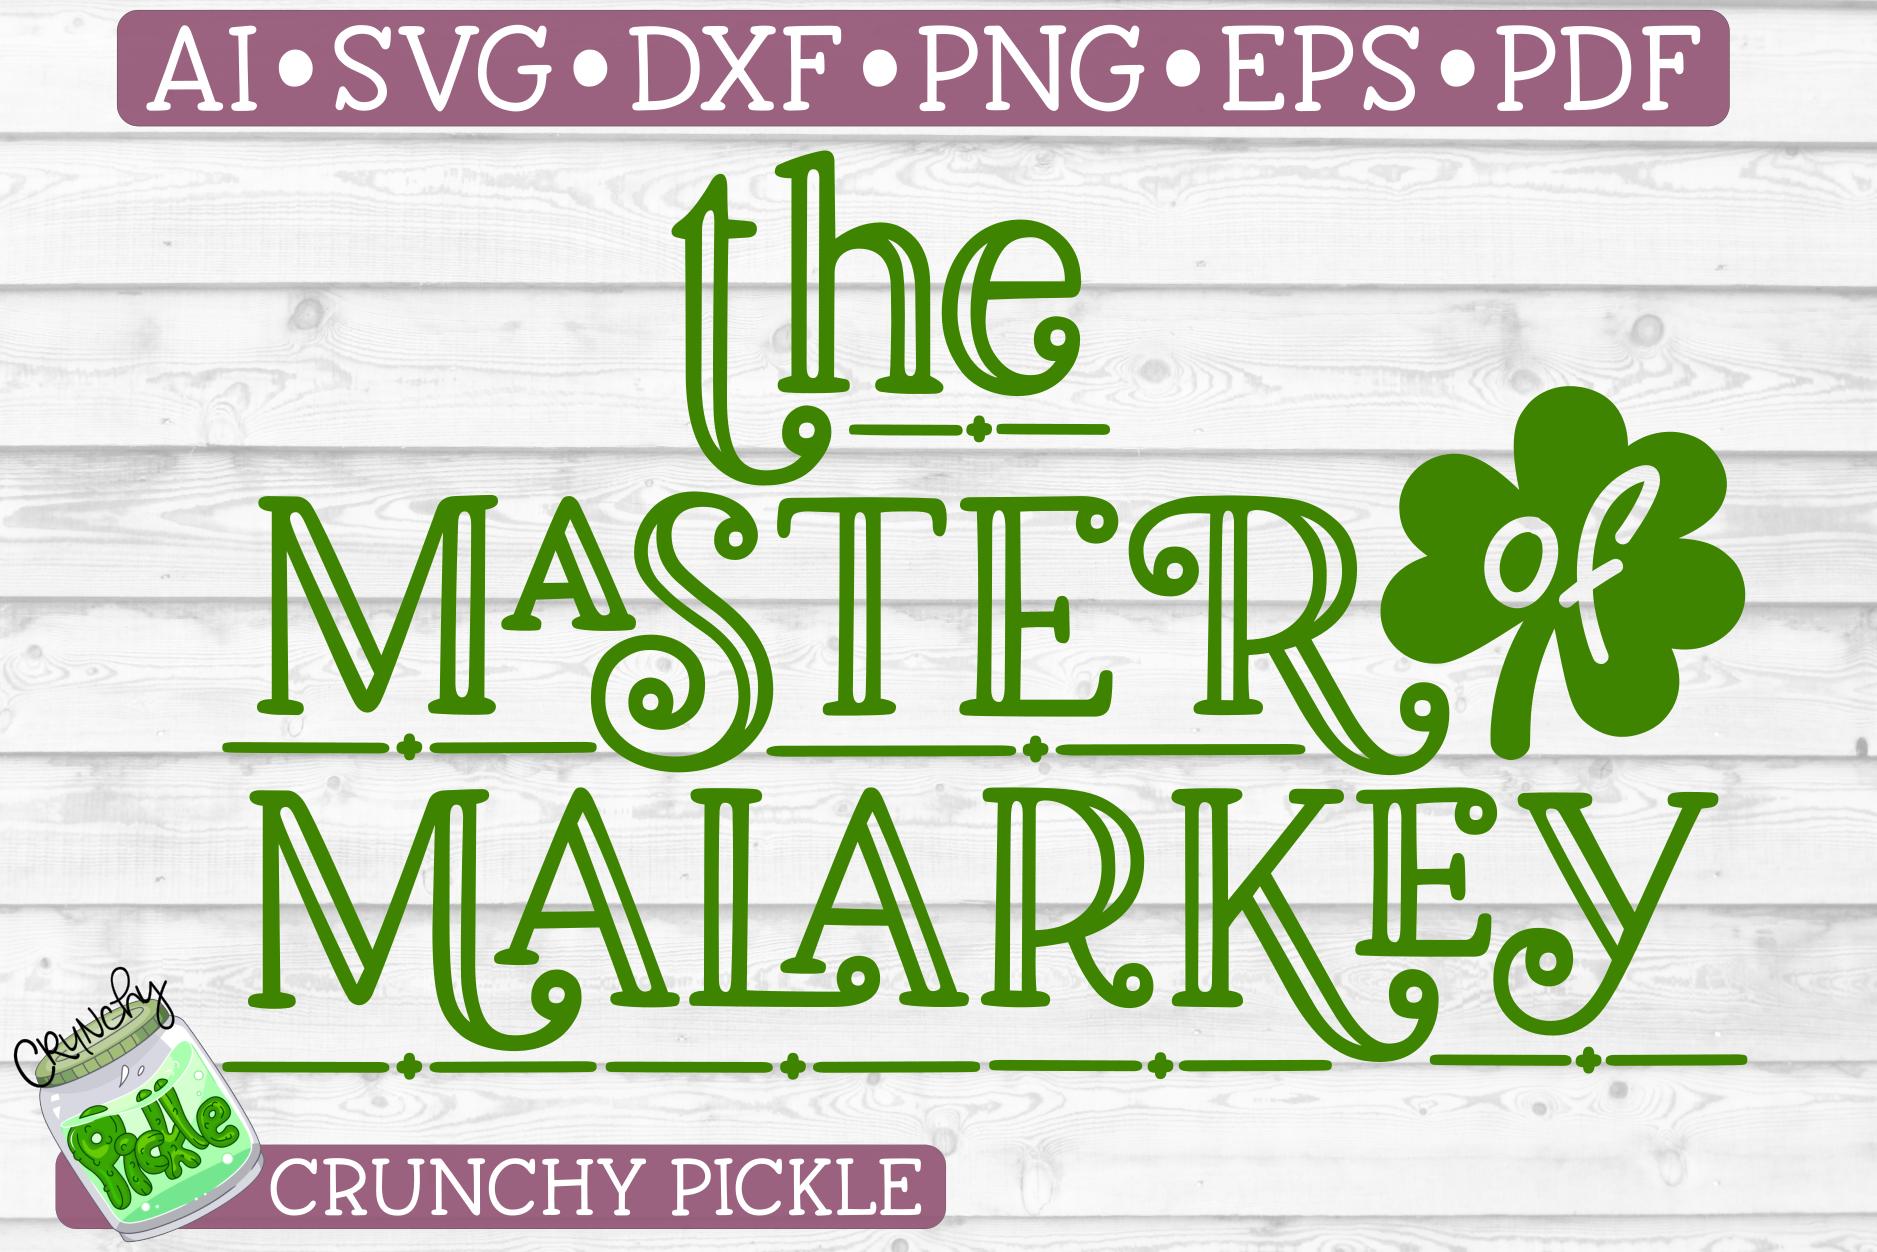 Master of Malarkey St. Patrick's Day SVG File example image 2